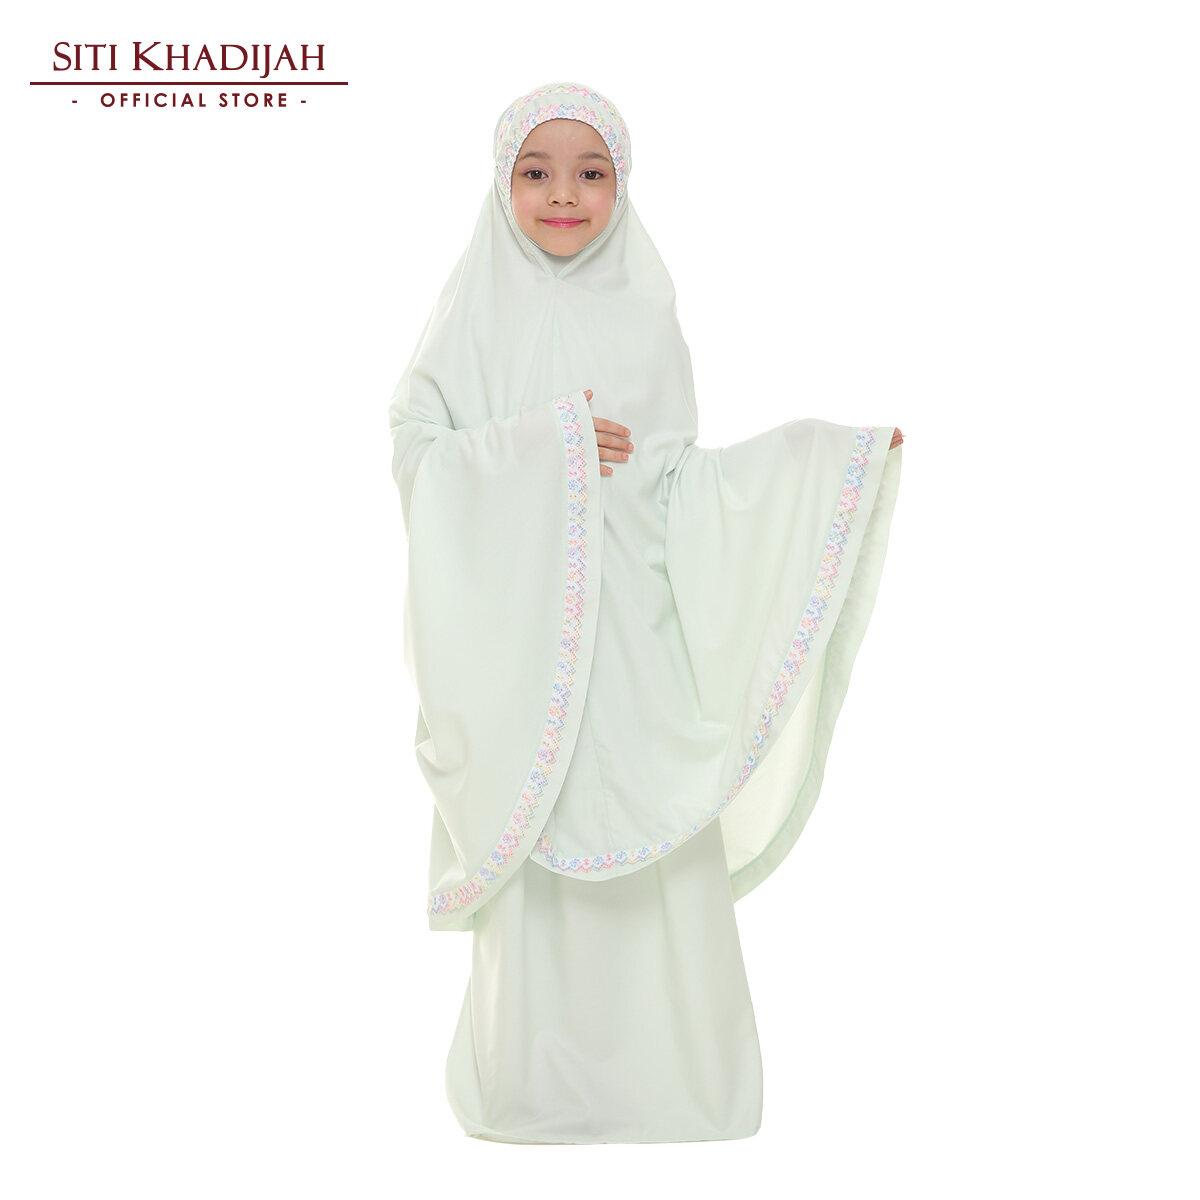 Siti Khadijah Telekung Kids Samira in Mint Green